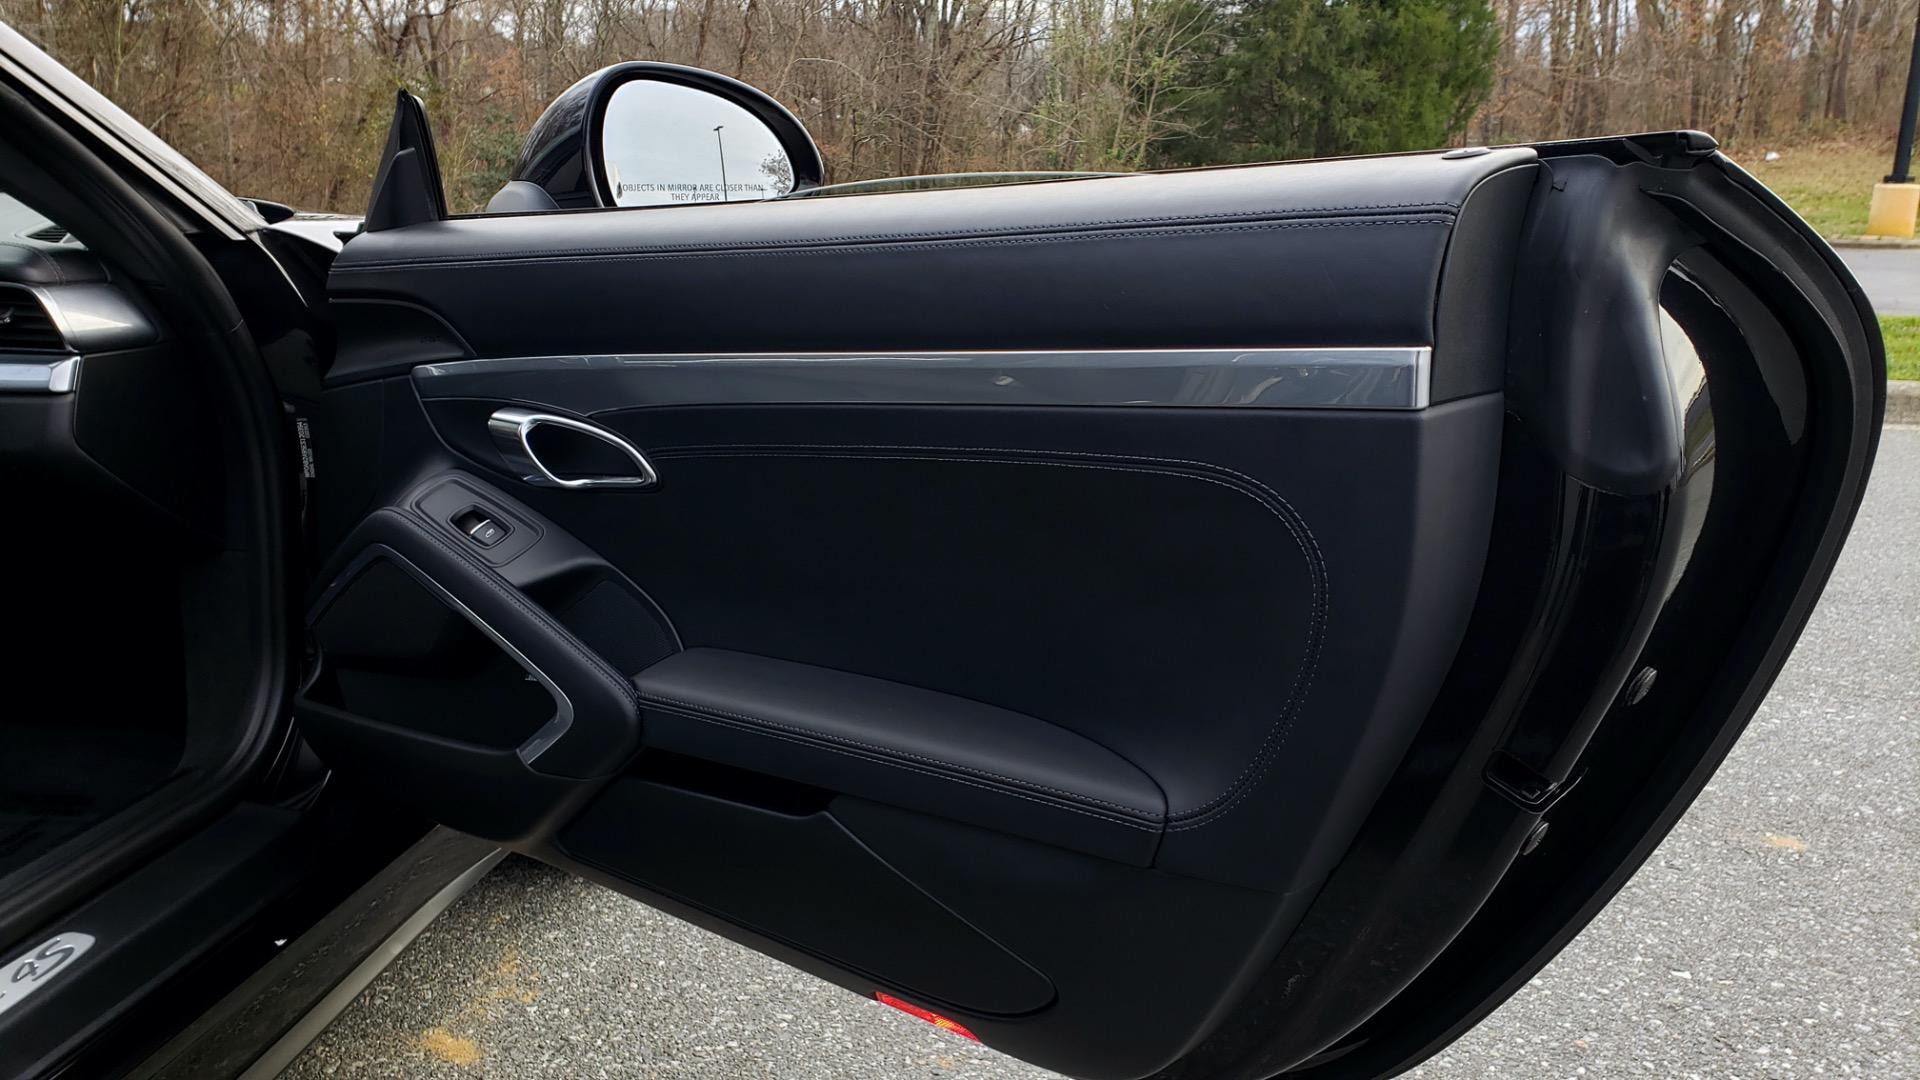 Used 2014 Porsche 911 CARRERA 4S / PREM PKG PLUS / NAV / SUNROO / BOSE / CHRONO for sale Sold at Formula Imports in Charlotte NC 28227 65